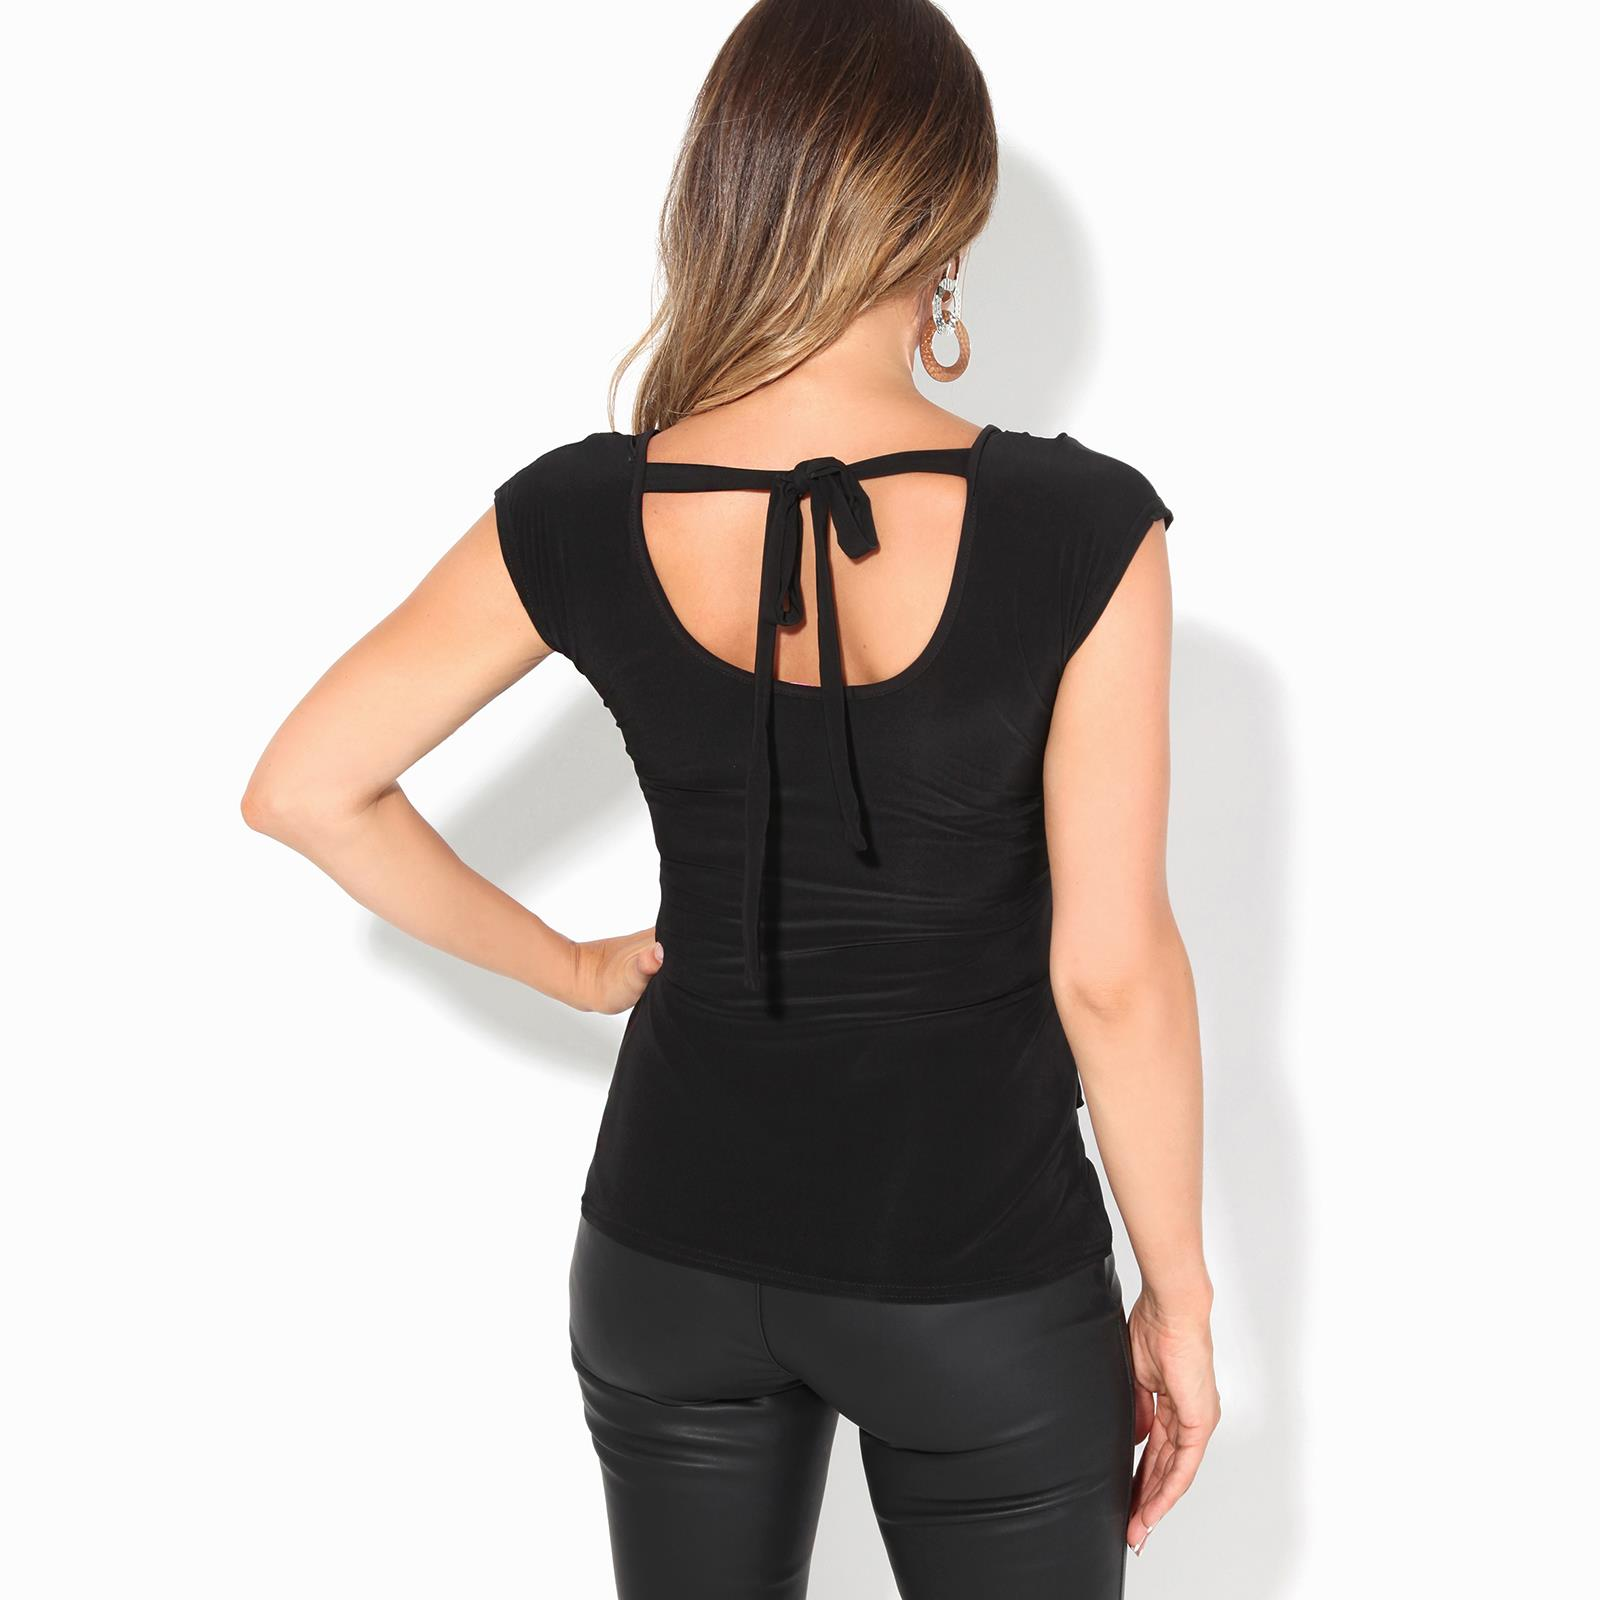 Womens-Ladies-Cowl-Neck-Top-Sleeveless-Silk-Drape-T-Shirt-Low-Cut-Back-Party thumbnail 3